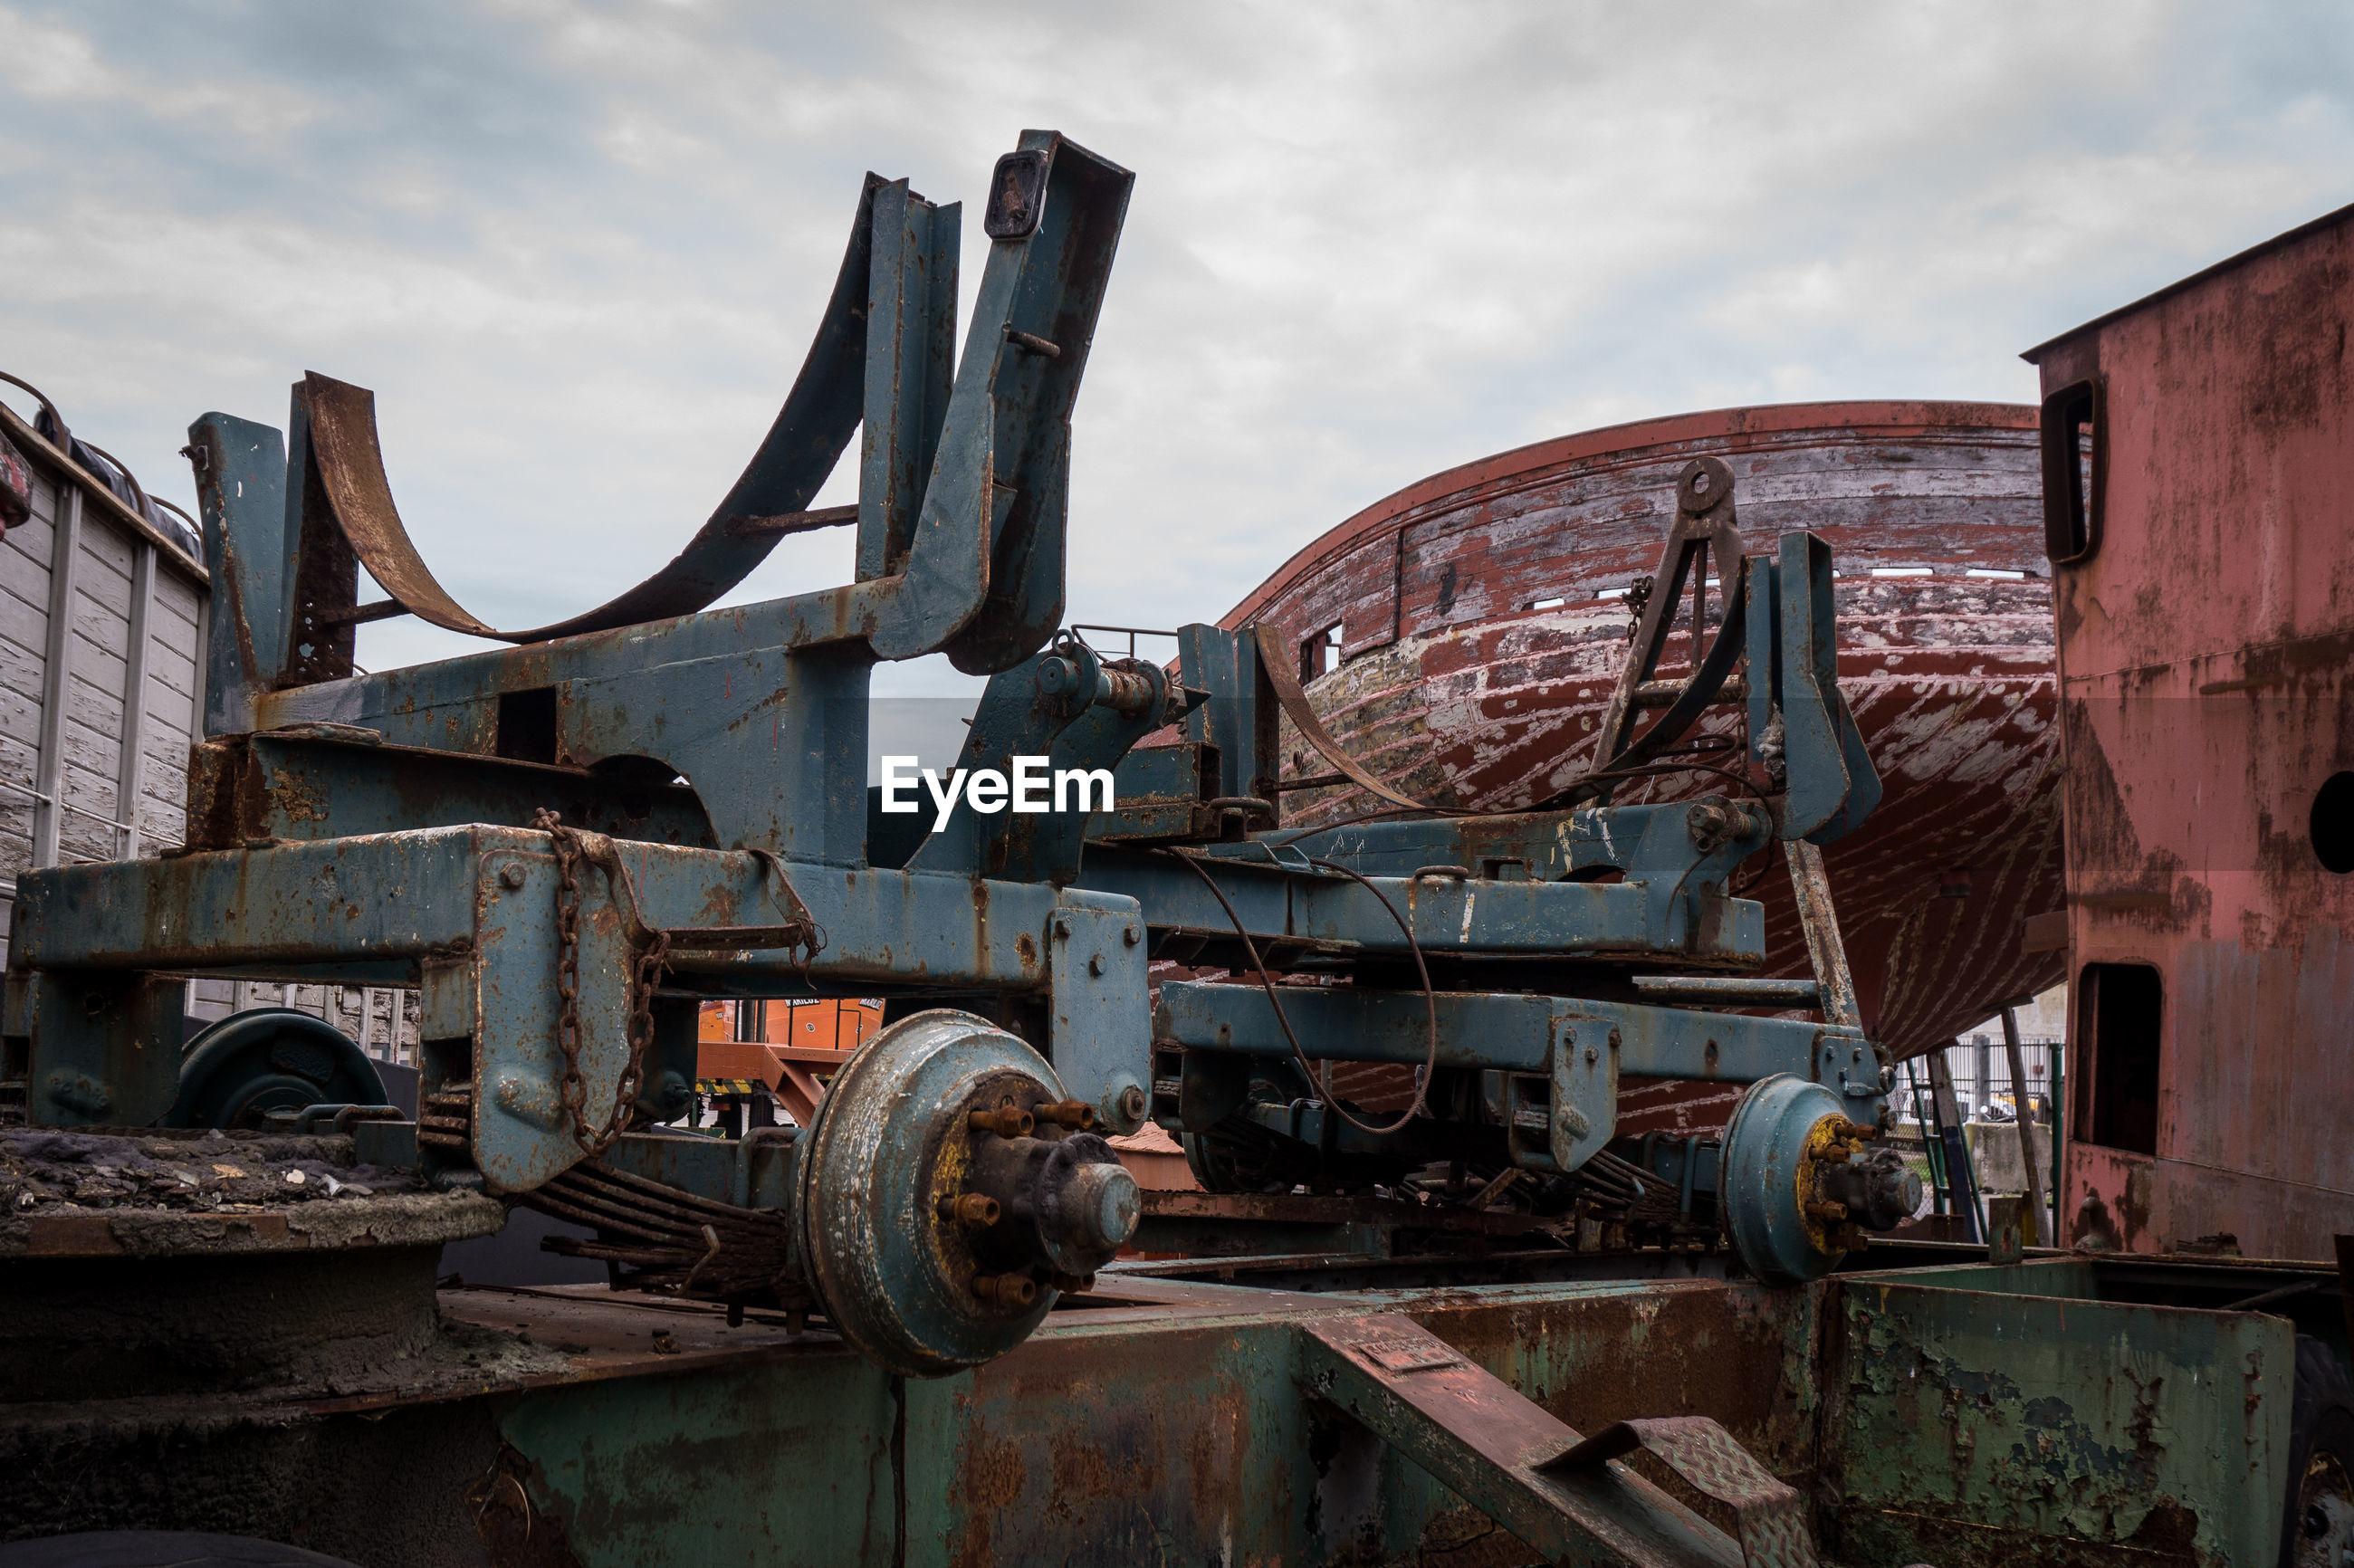 Abandoned rusty land vehicle against sky